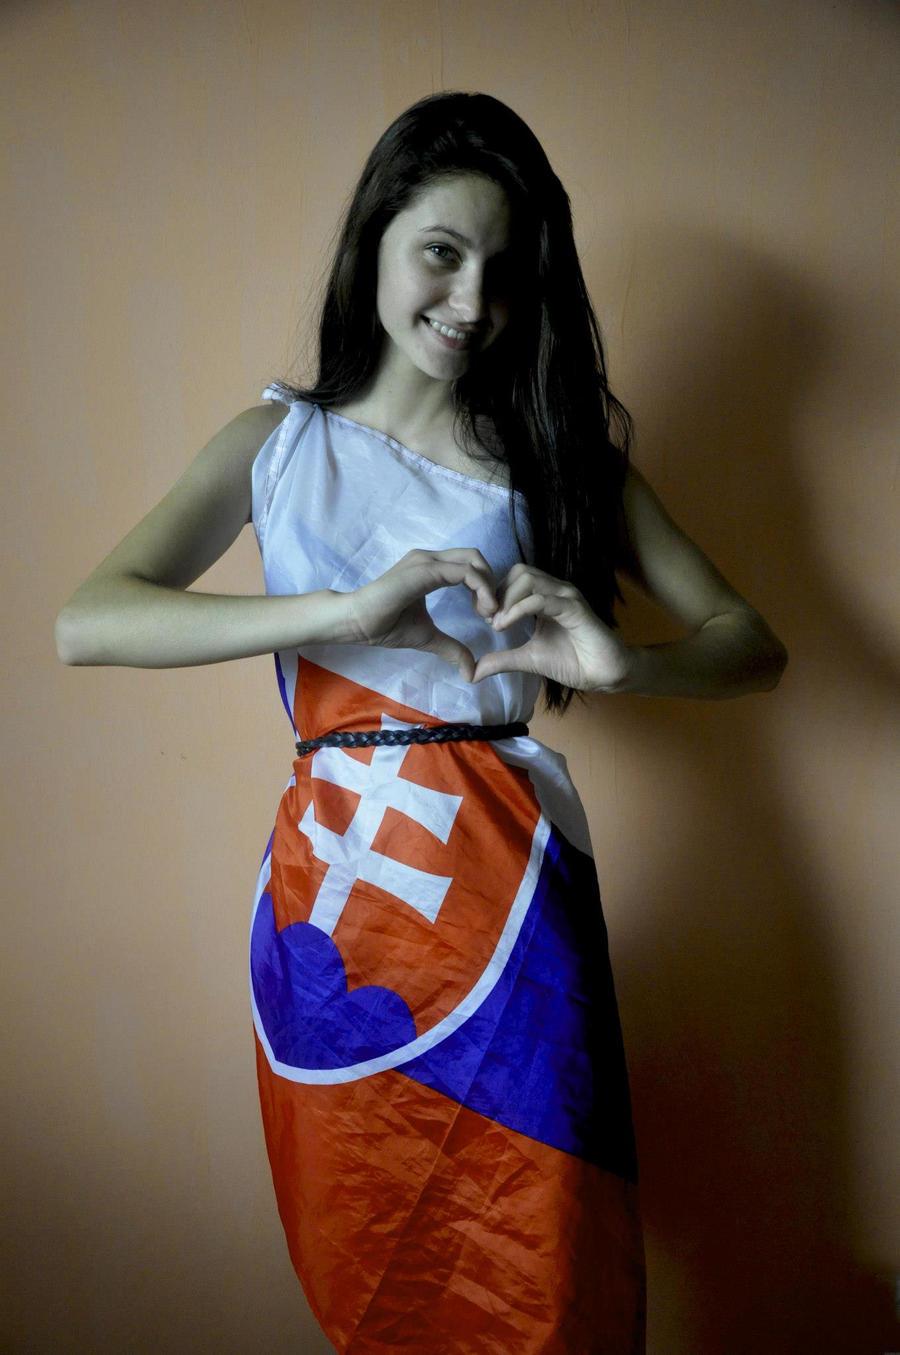 slovakia girls